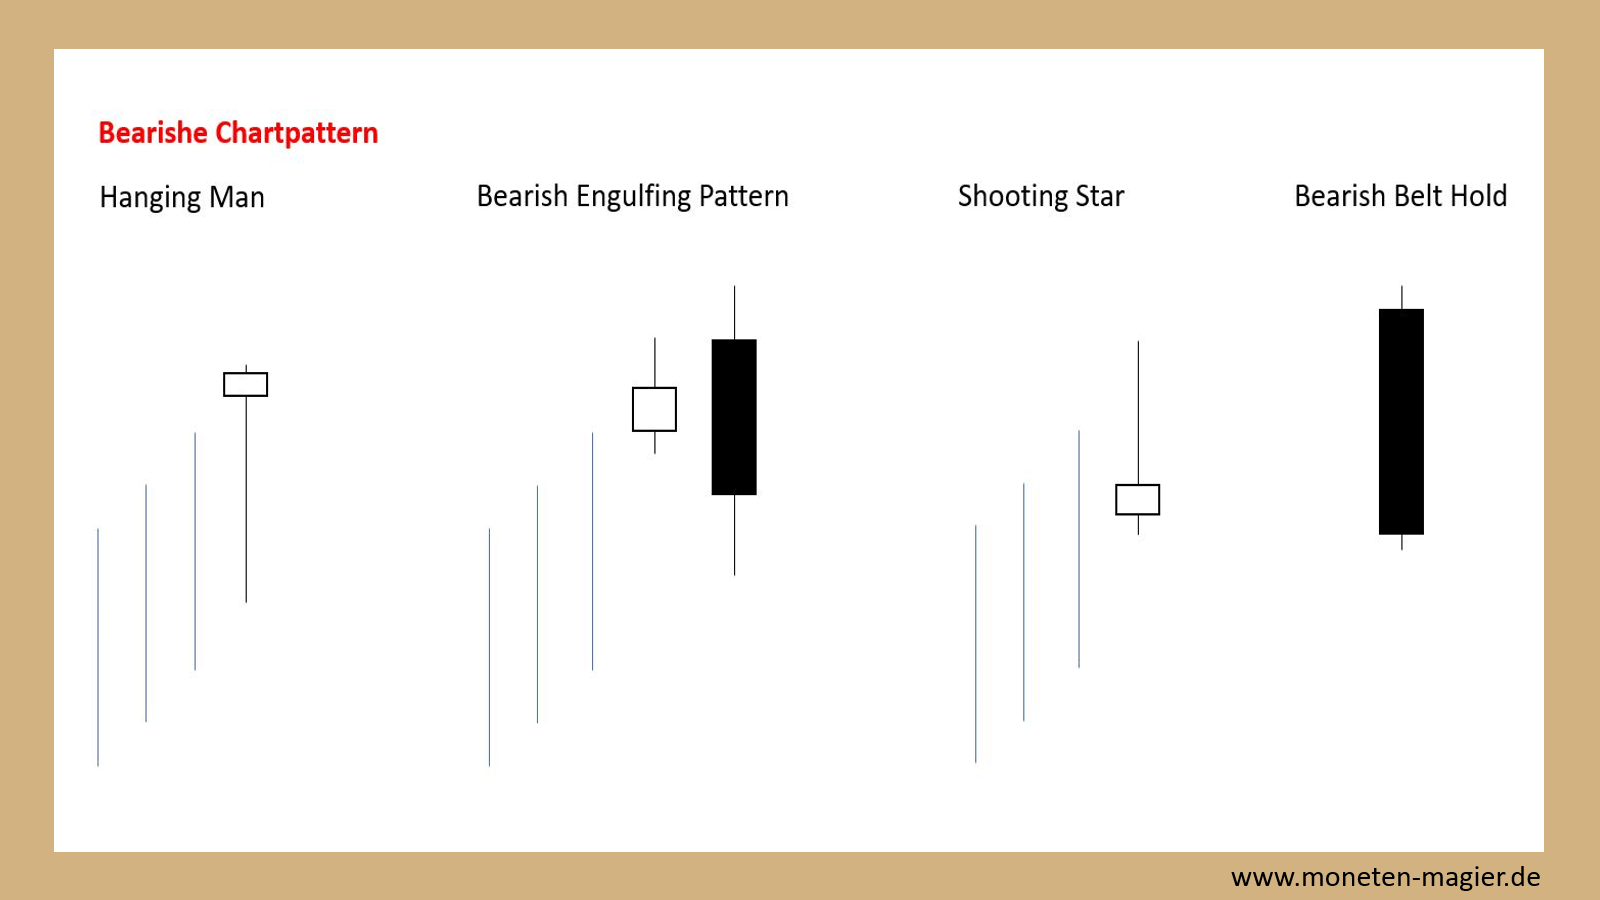 candlesticks chart pattern moneten magier bearishe chartpattern